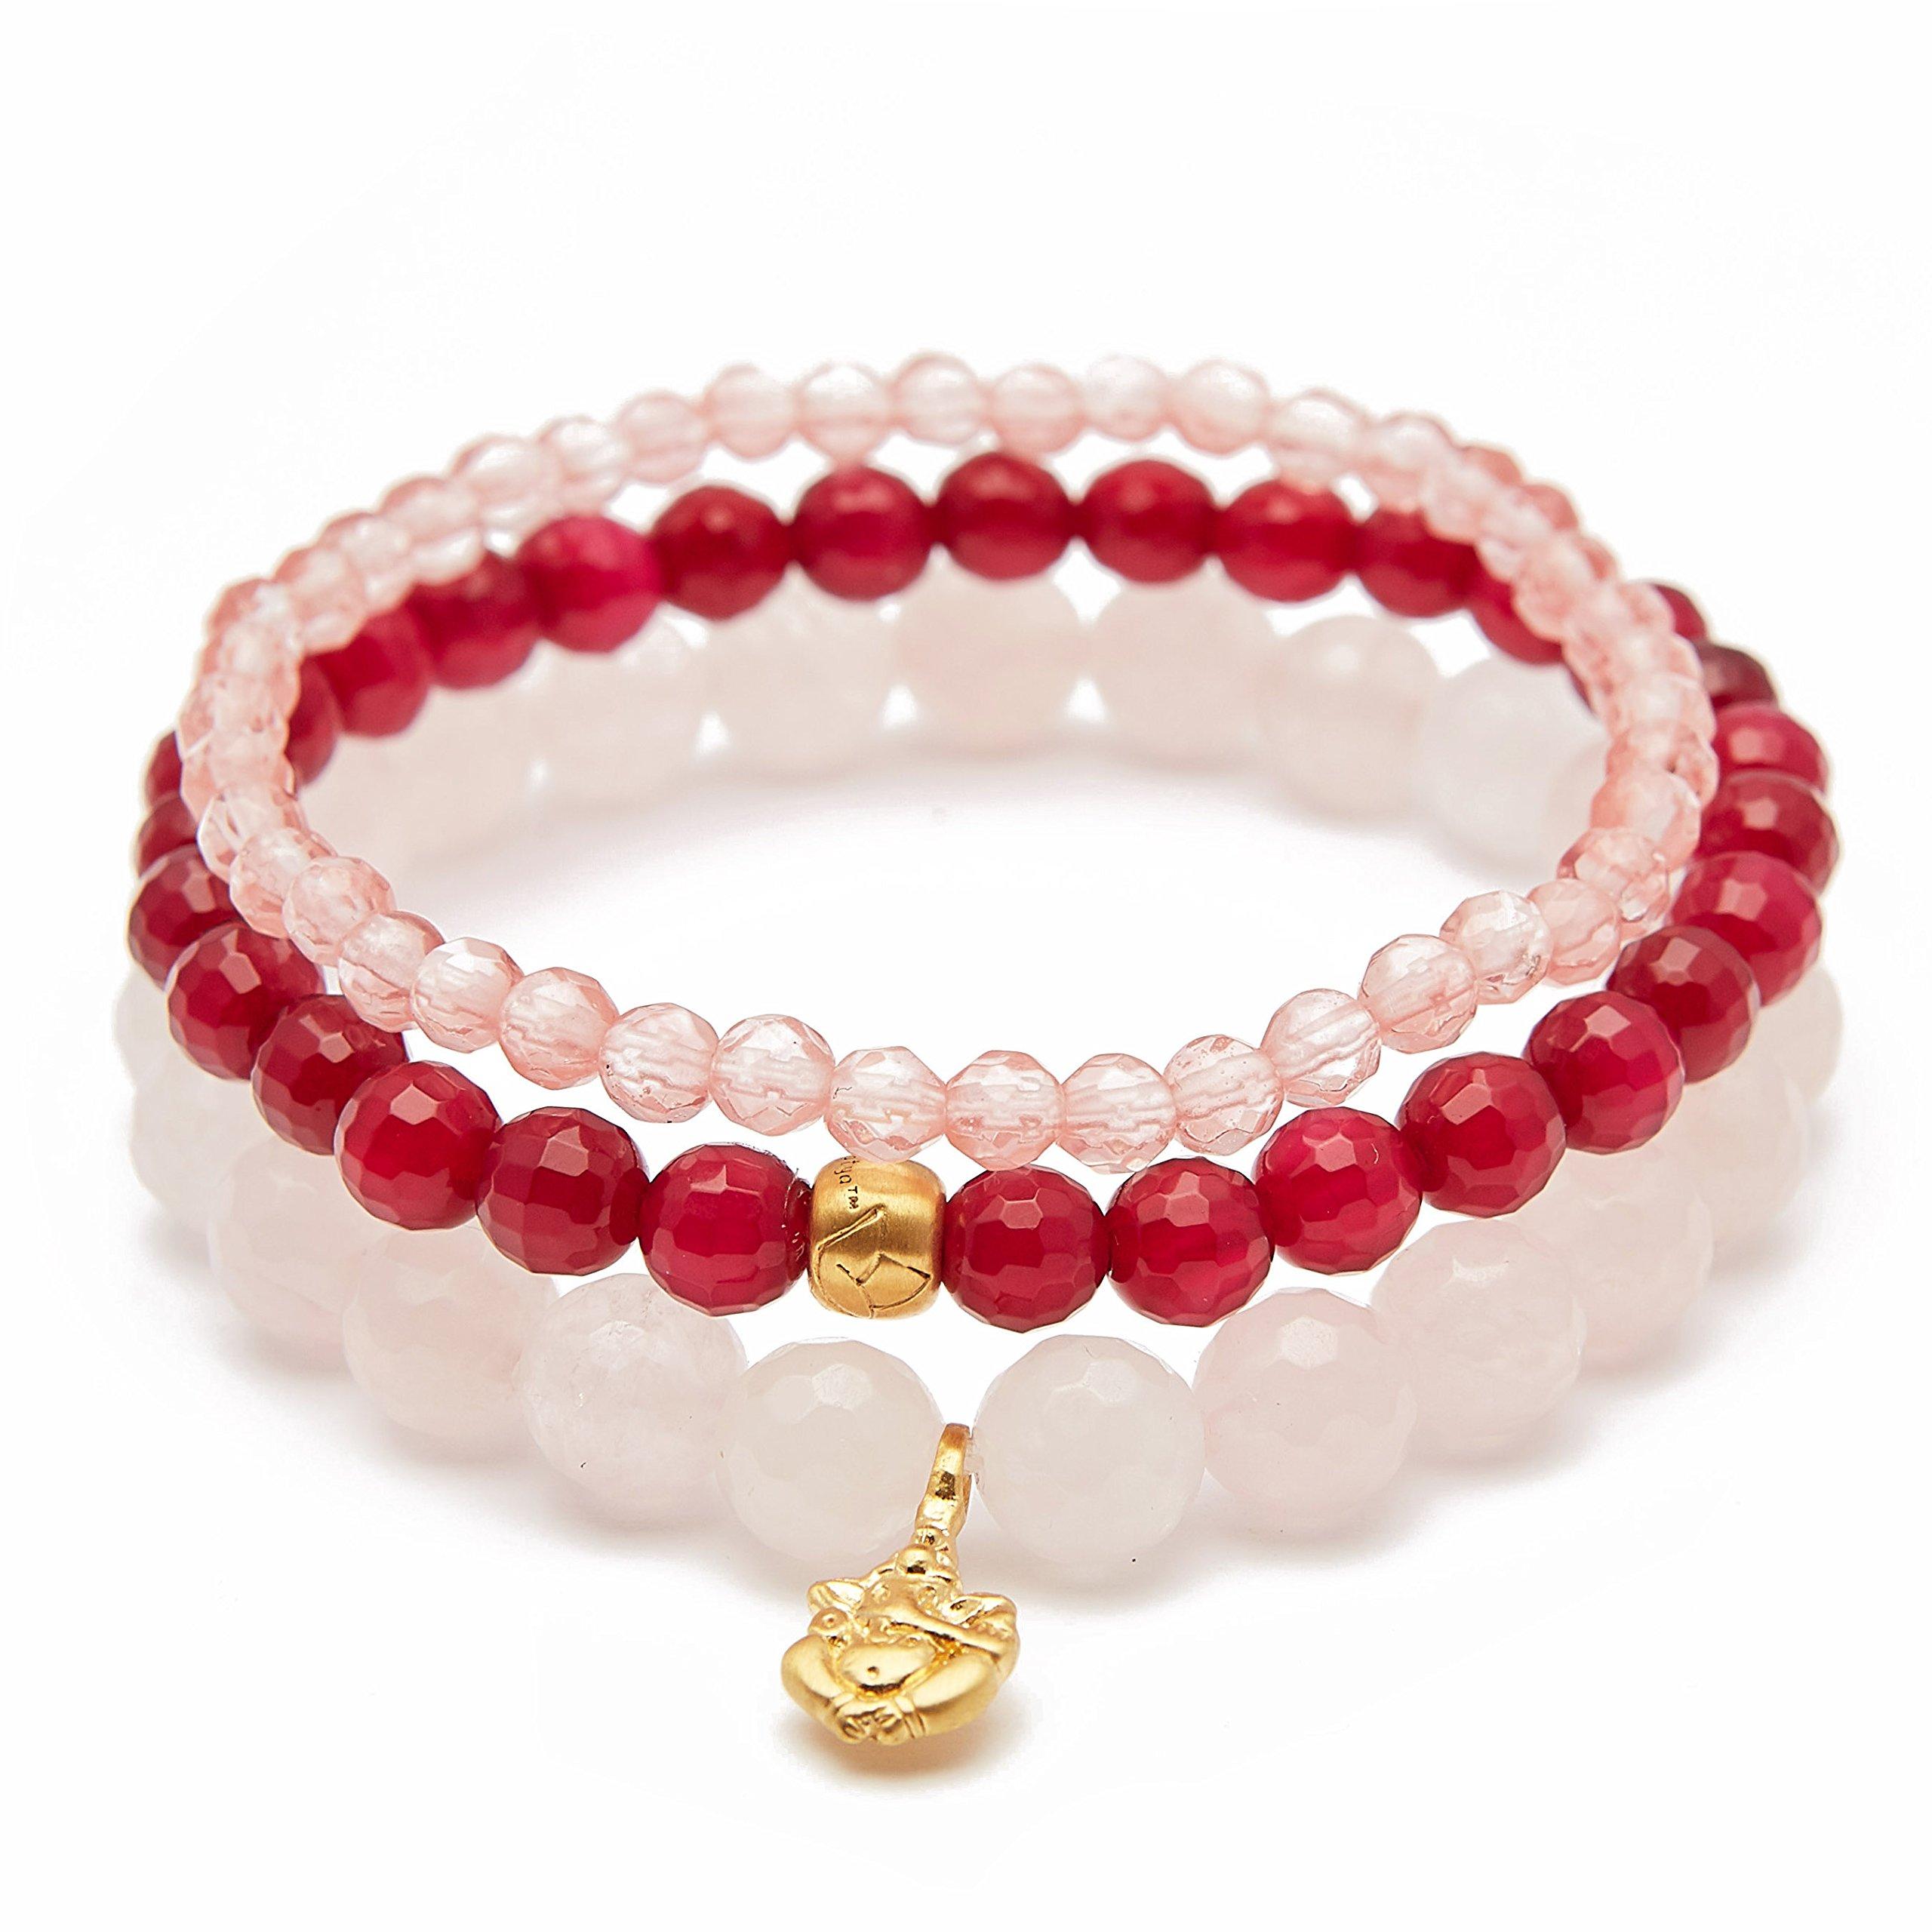 Satya Jewelry Women's Rose Quartz Fuchsia Agate Cherry Quartz Gold Ganesha Lotus Stretch Bracelet Set, One Size